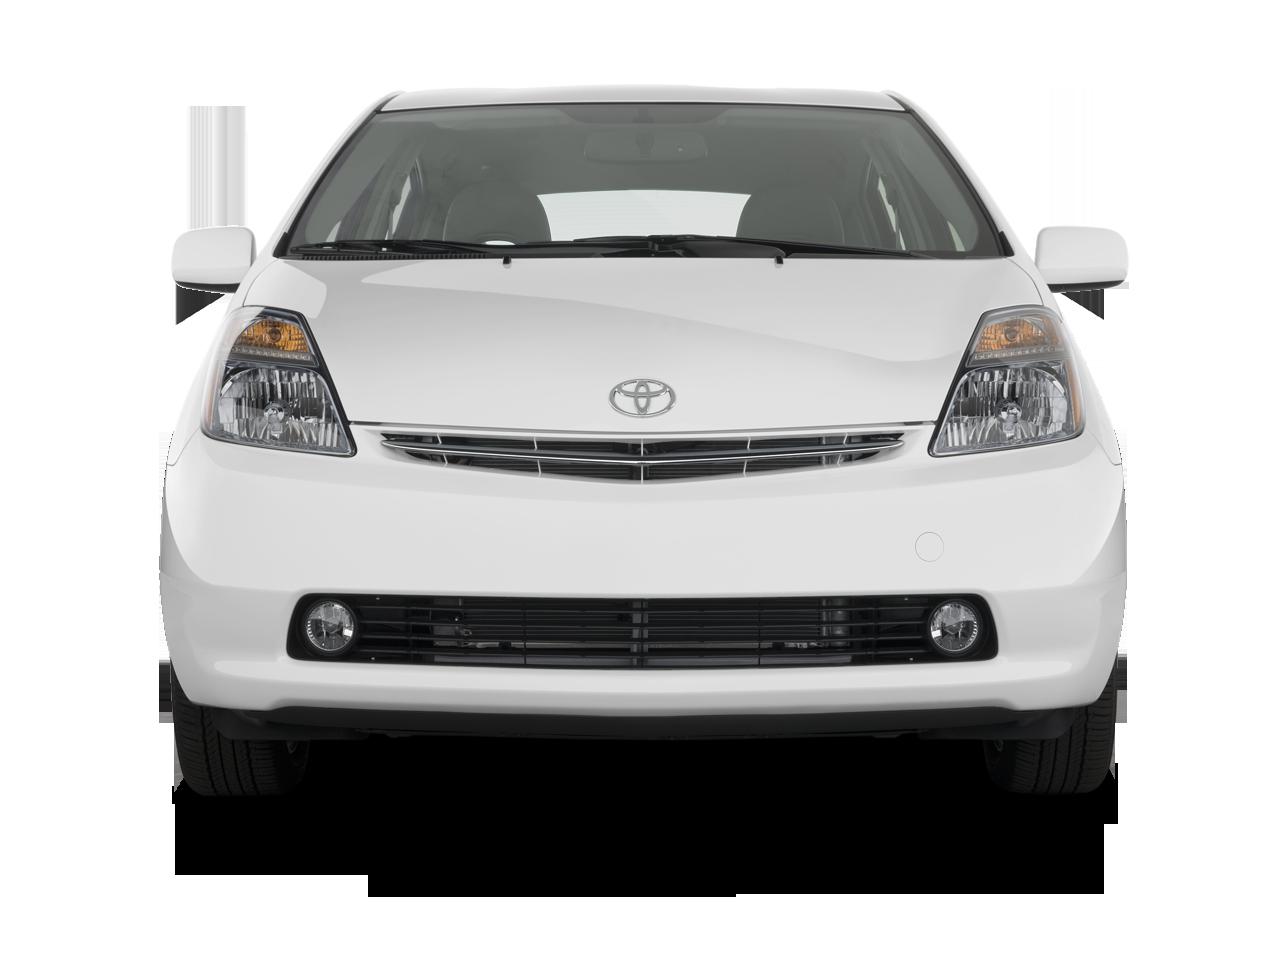 2008 toyota prius touring edition toyota hybrid sedan review automobile magazine. Black Bedroom Furniture Sets. Home Design Ideas